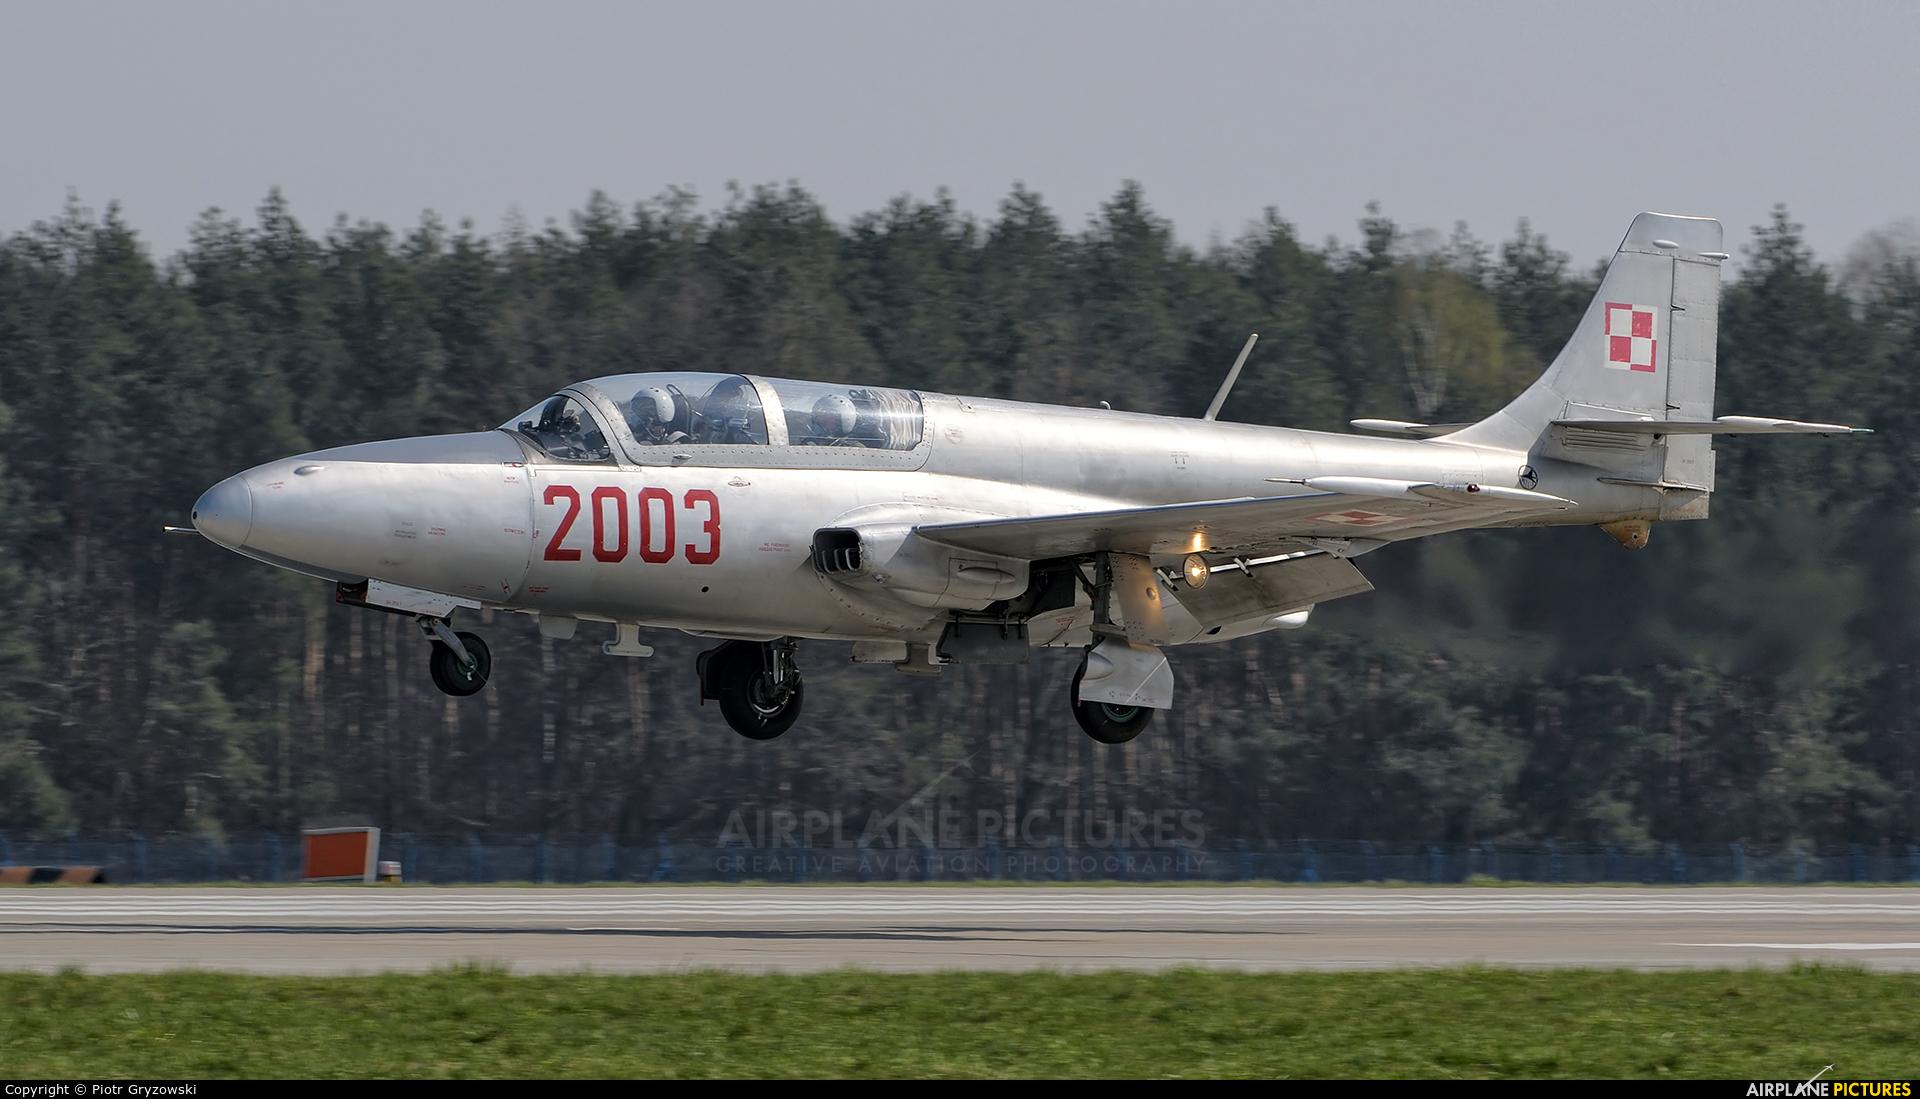 Poland - Air Force 2003 aircraft at Dęblin